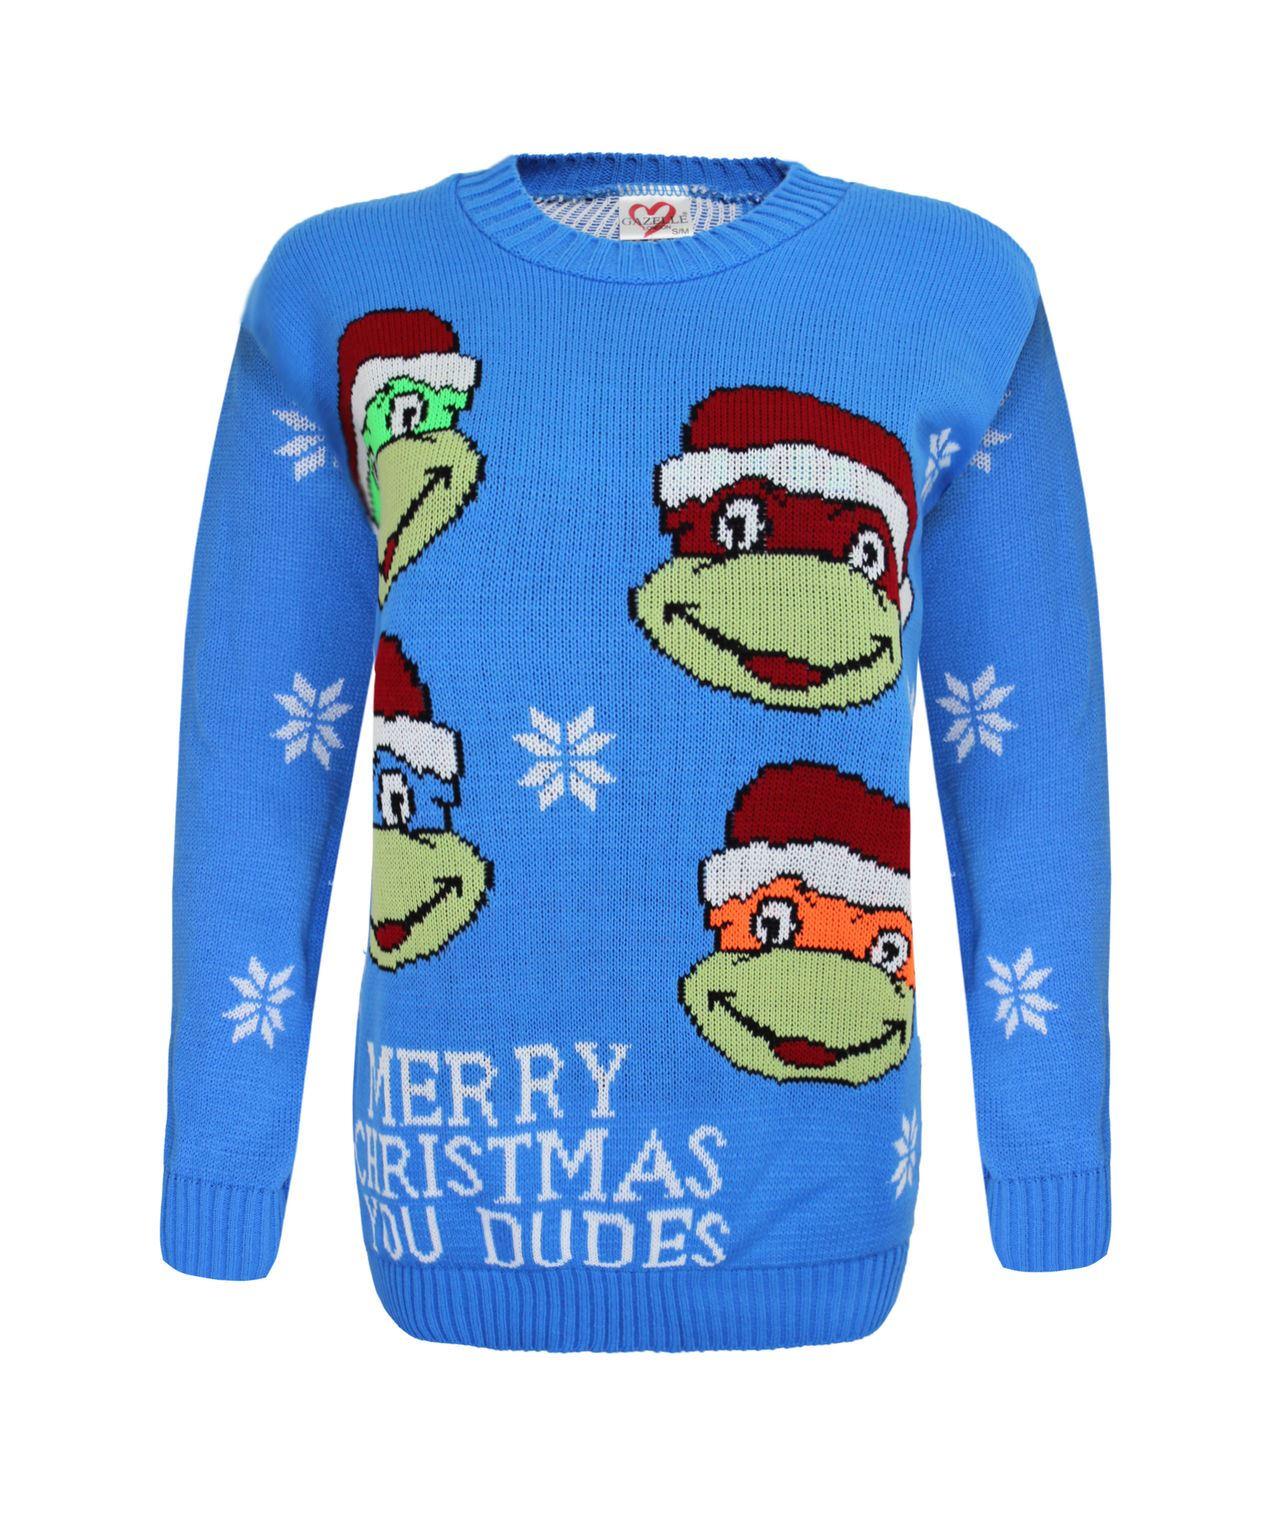 Knitting Pattern For Ninja Turtles Jumper : KIDS KNITTED REINDEER TURTLE NINJA CHRISTAMS JUMPER XMAS ...